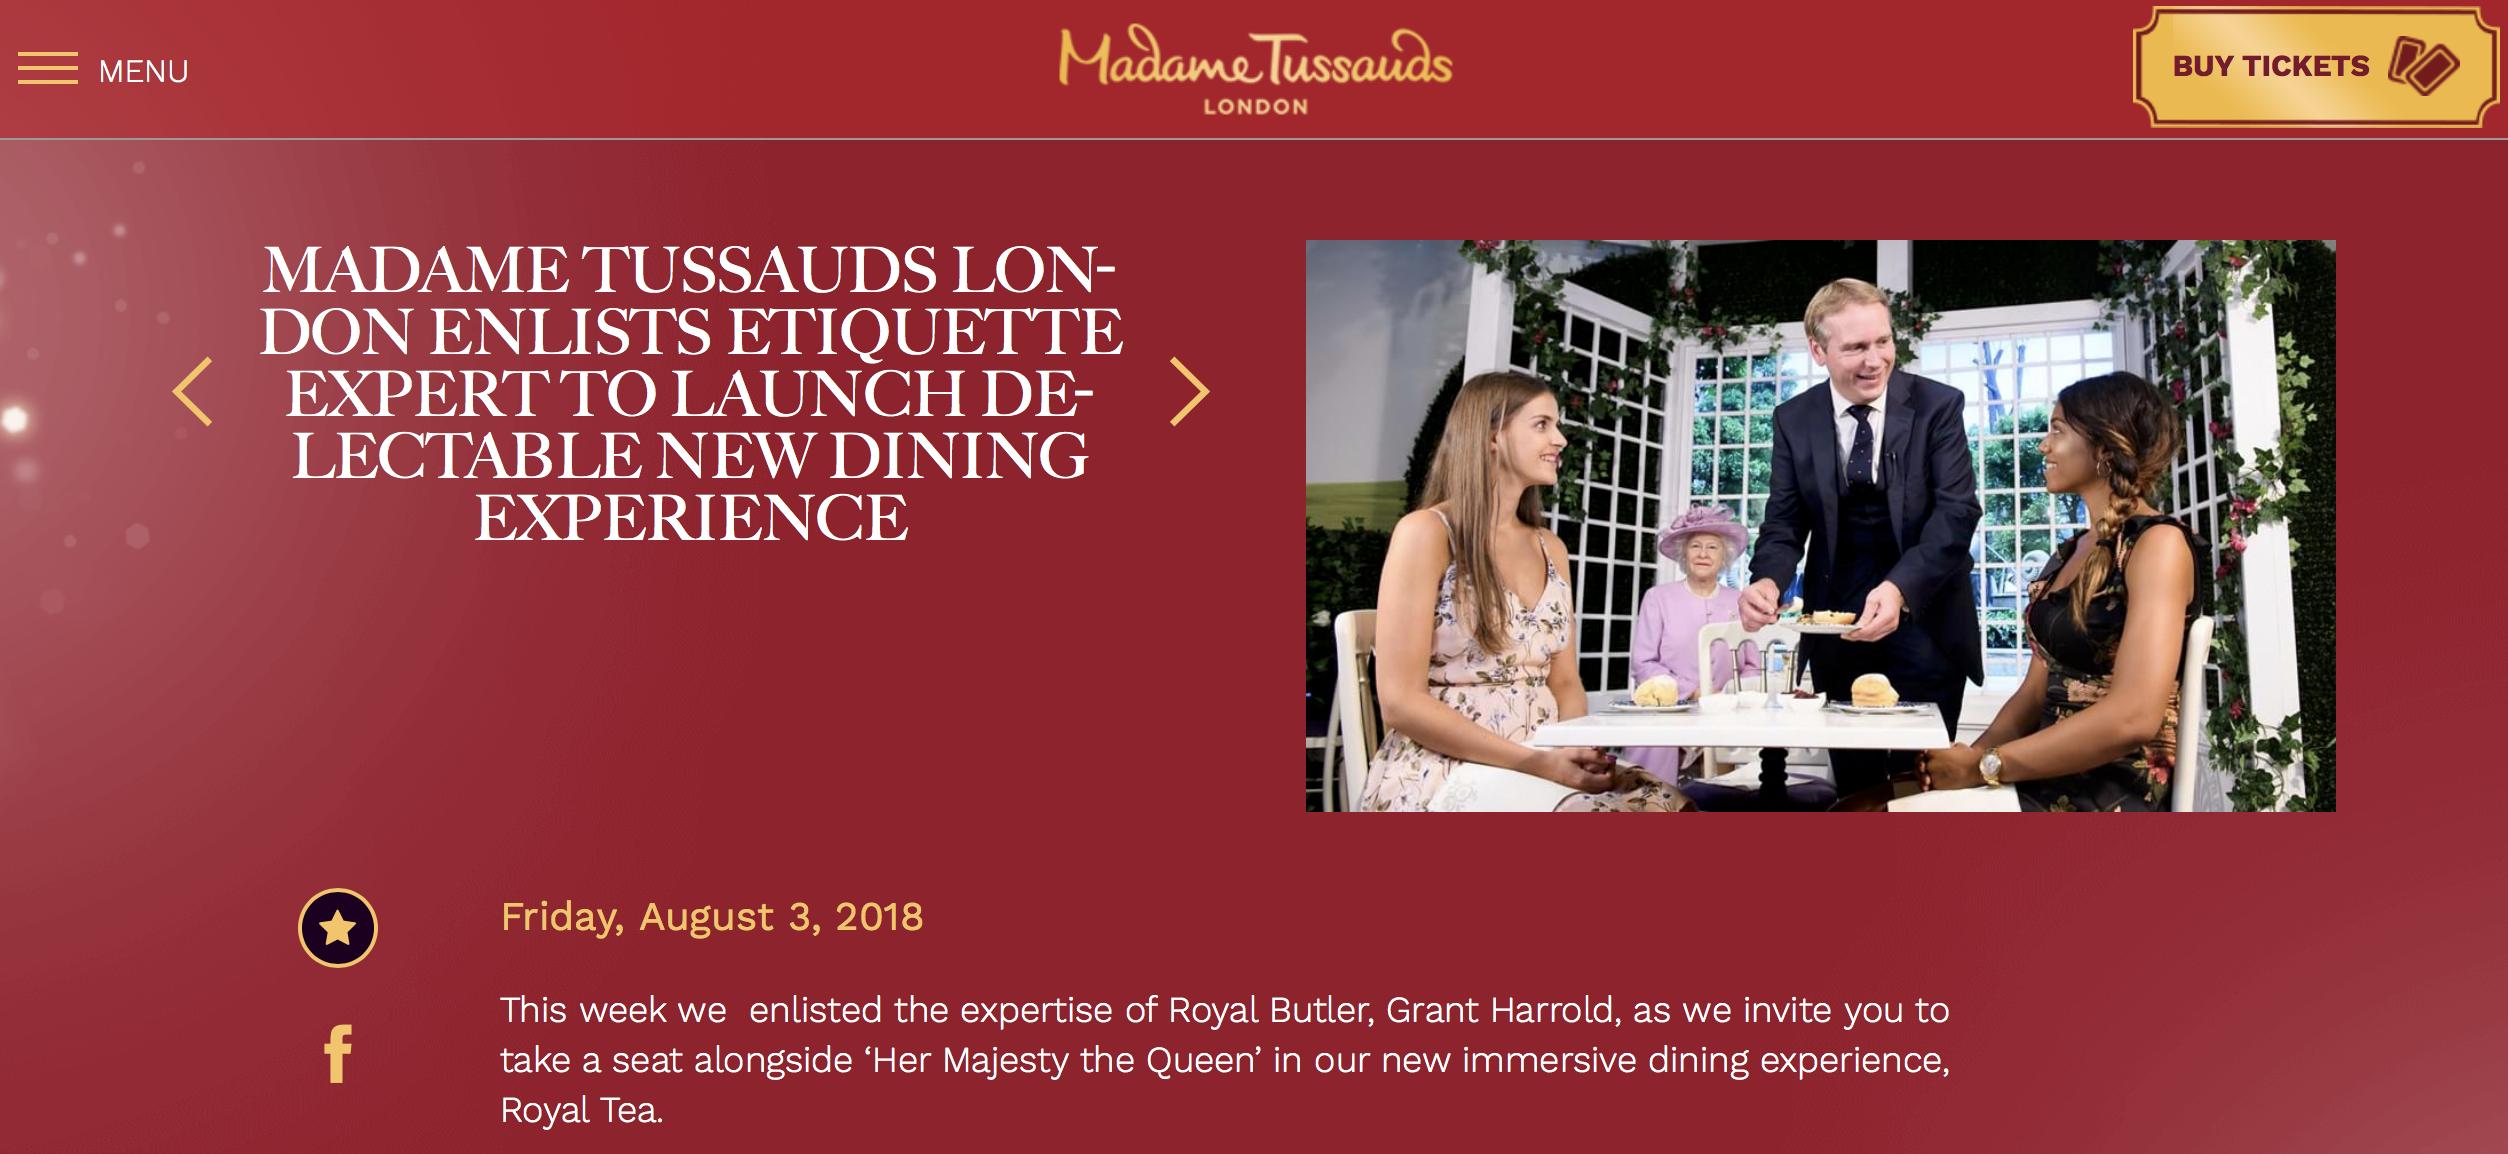 Madame Tussauds & The Royal Butler